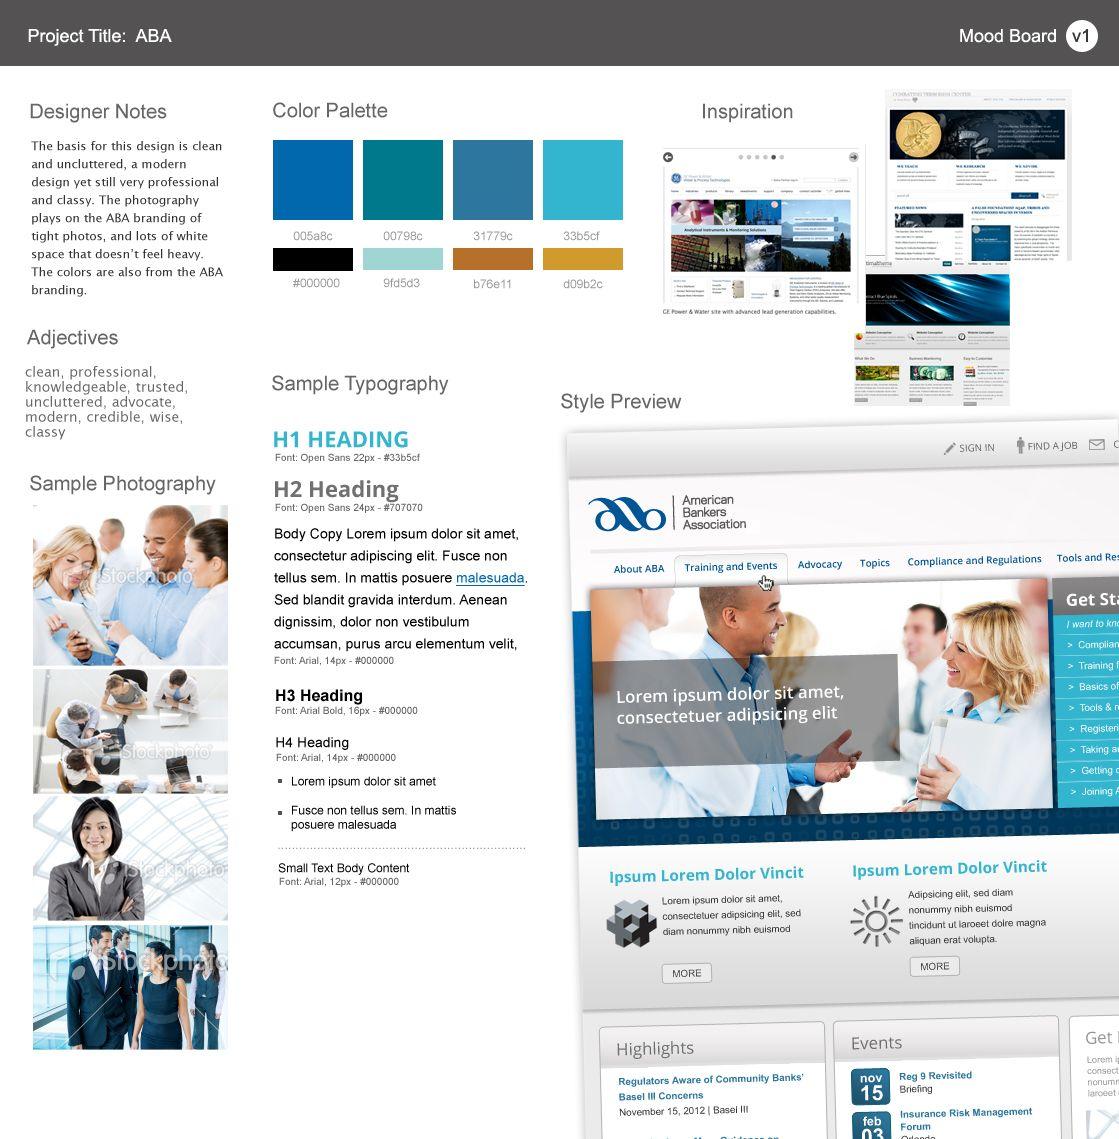 Aba Moodboard 1 Moodboard Coolcolors Bank Webdesign Clean Uncluttered Design Mood Board Design Mood Board Design